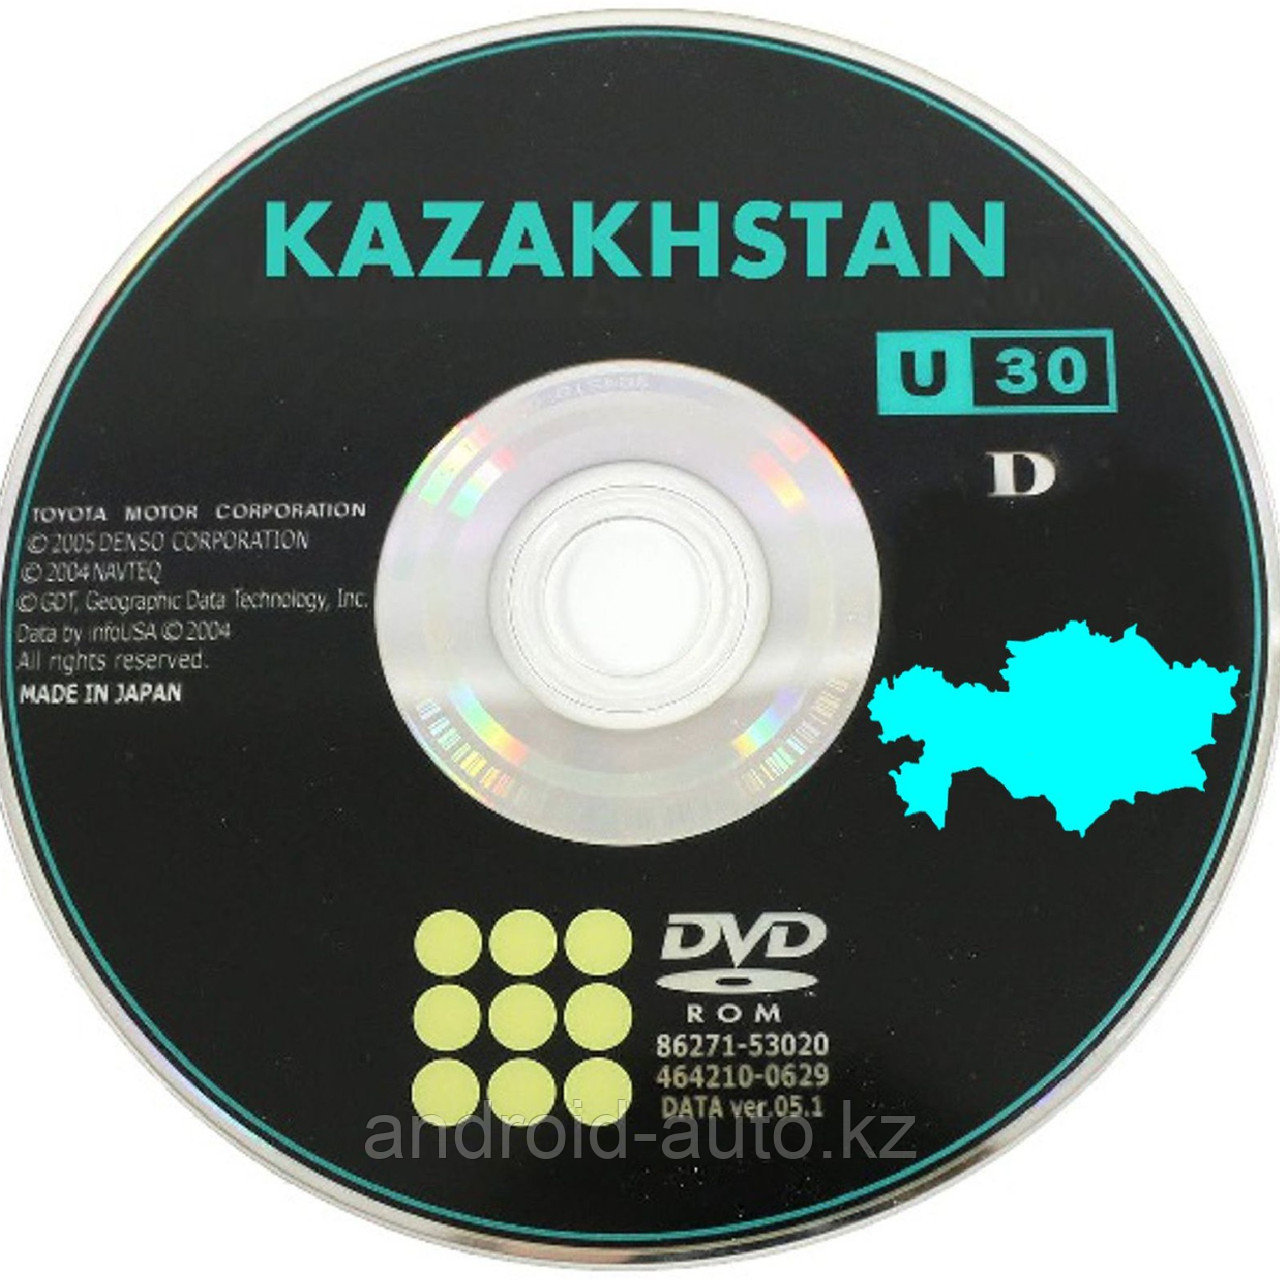 GEN-4 DVD NAVIGATION MAP of KAZAKHSTAN - (DENSO) TOYOTA CAMRY 30-35